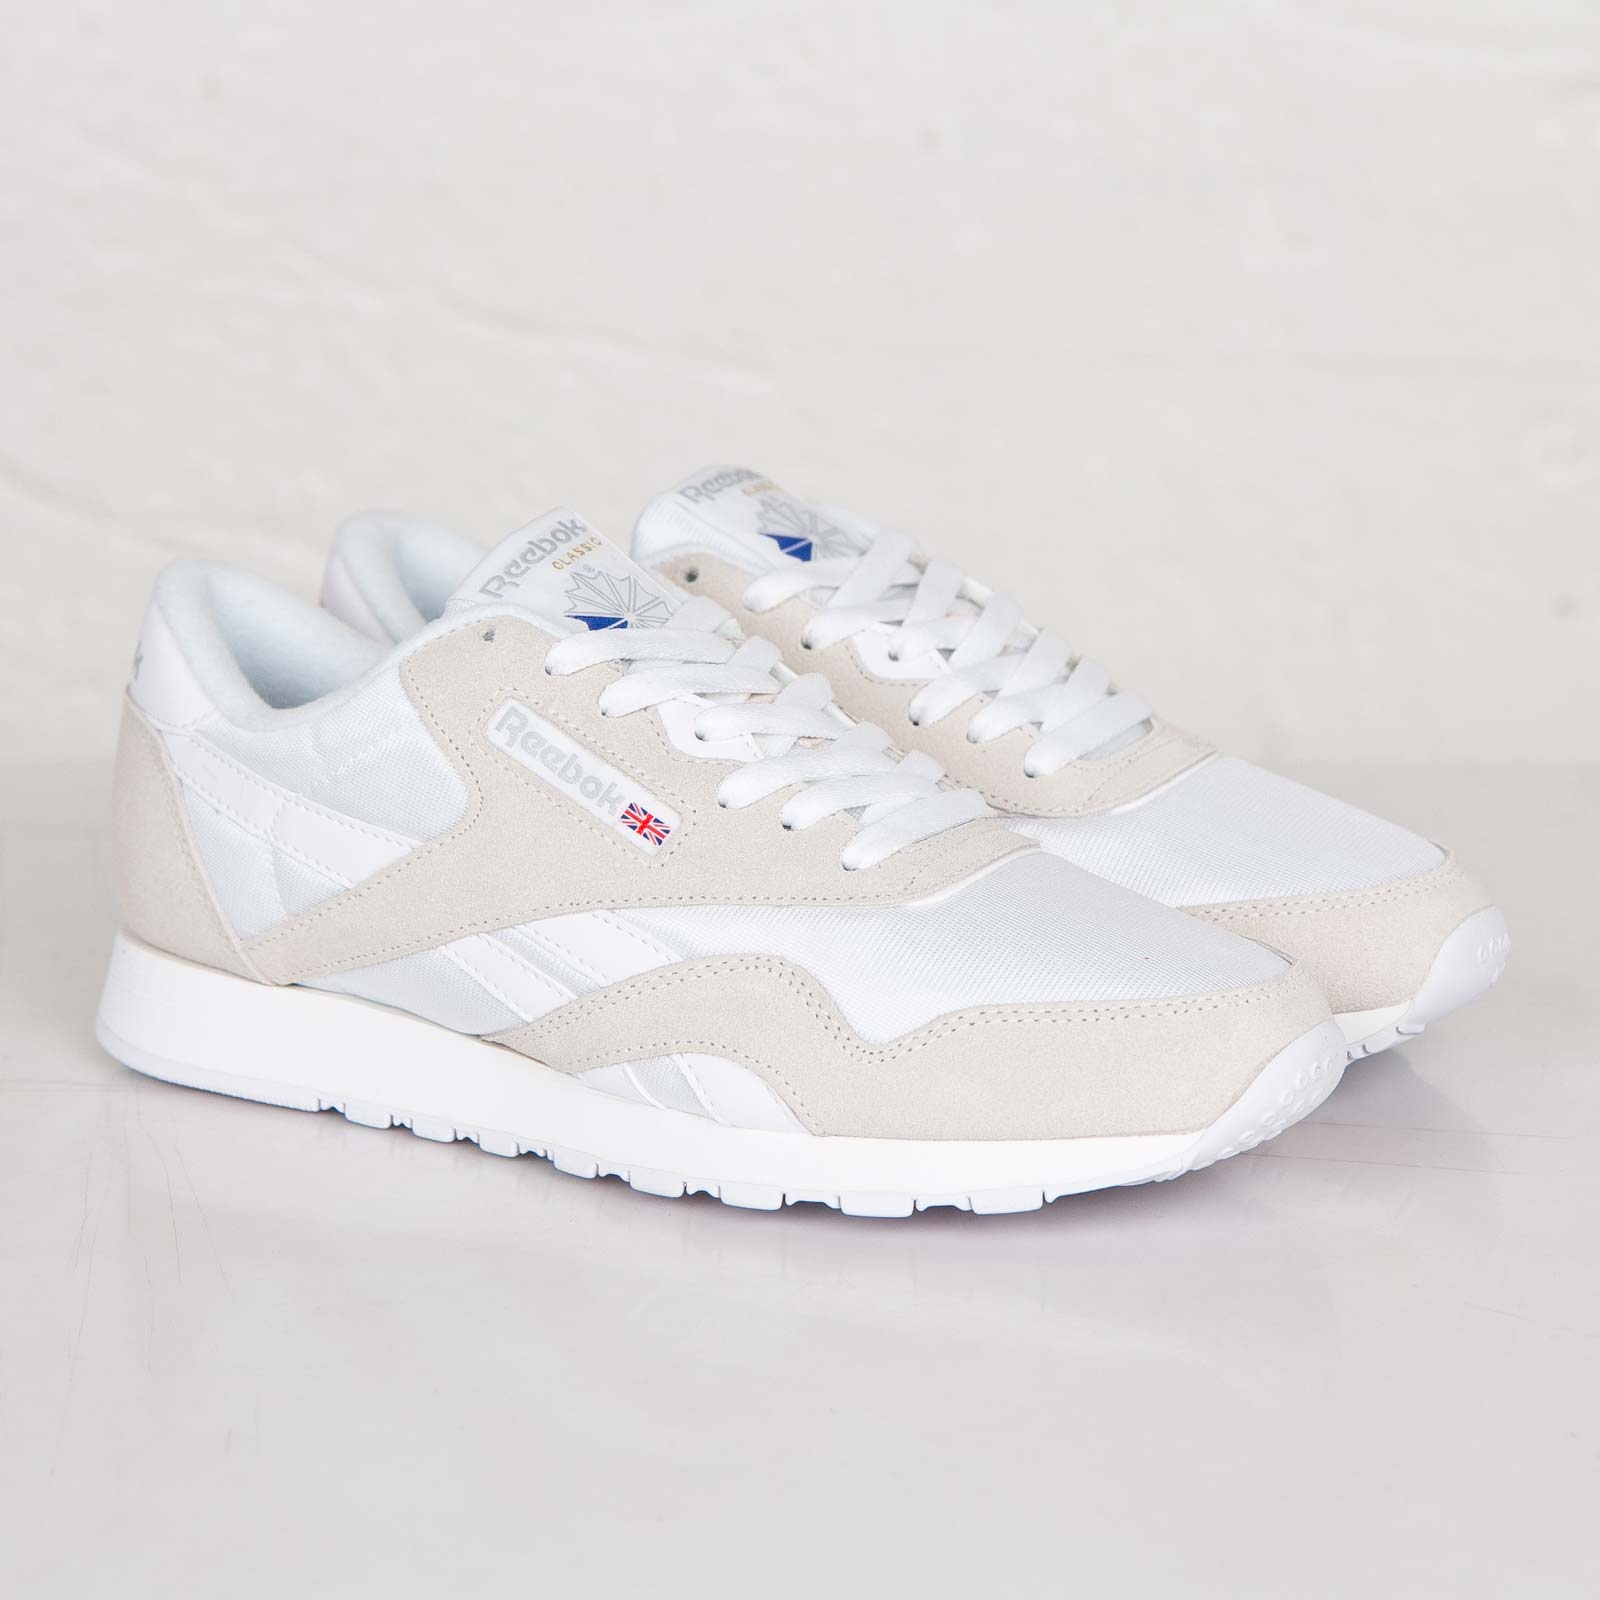 a8ff86514a77 Reebok Classic Nylon - 6390 - Sneakersnstuff